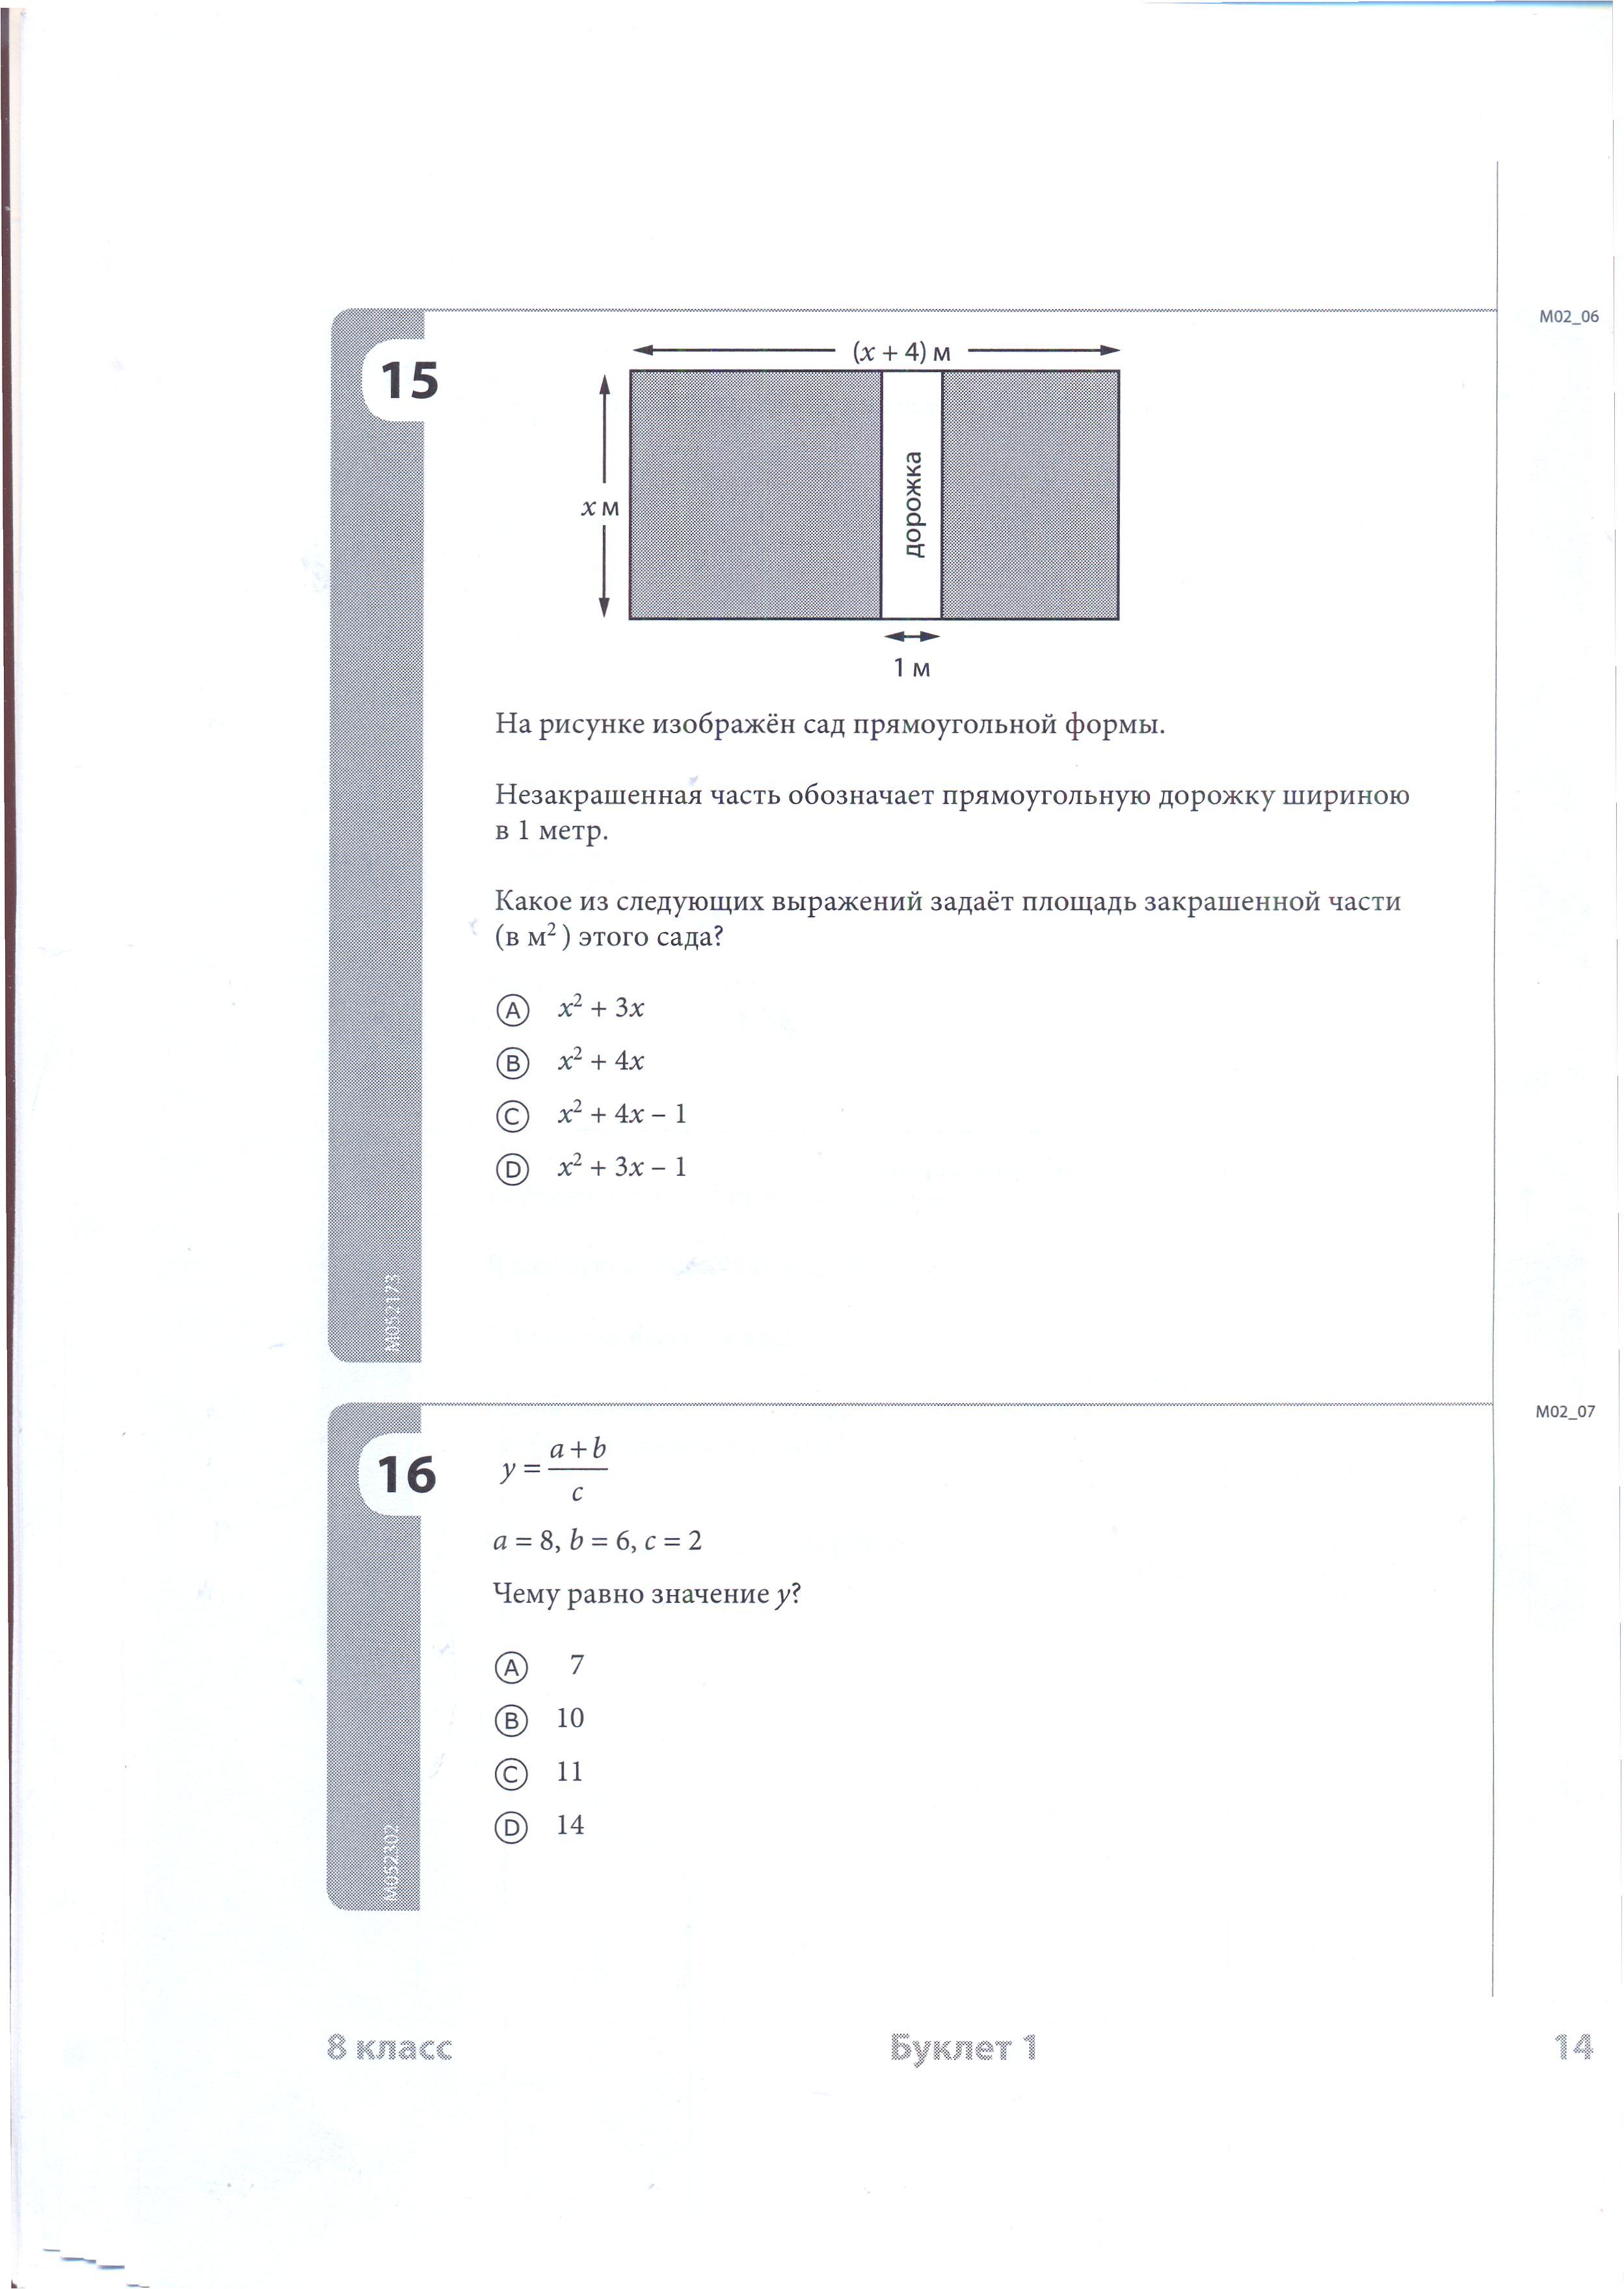 H:\Доклад ТИМСС Алматы 8.04.2014\TIMSS MATEM 8 kl_1 var\Matematic 8 kl_1 var0010.jpg